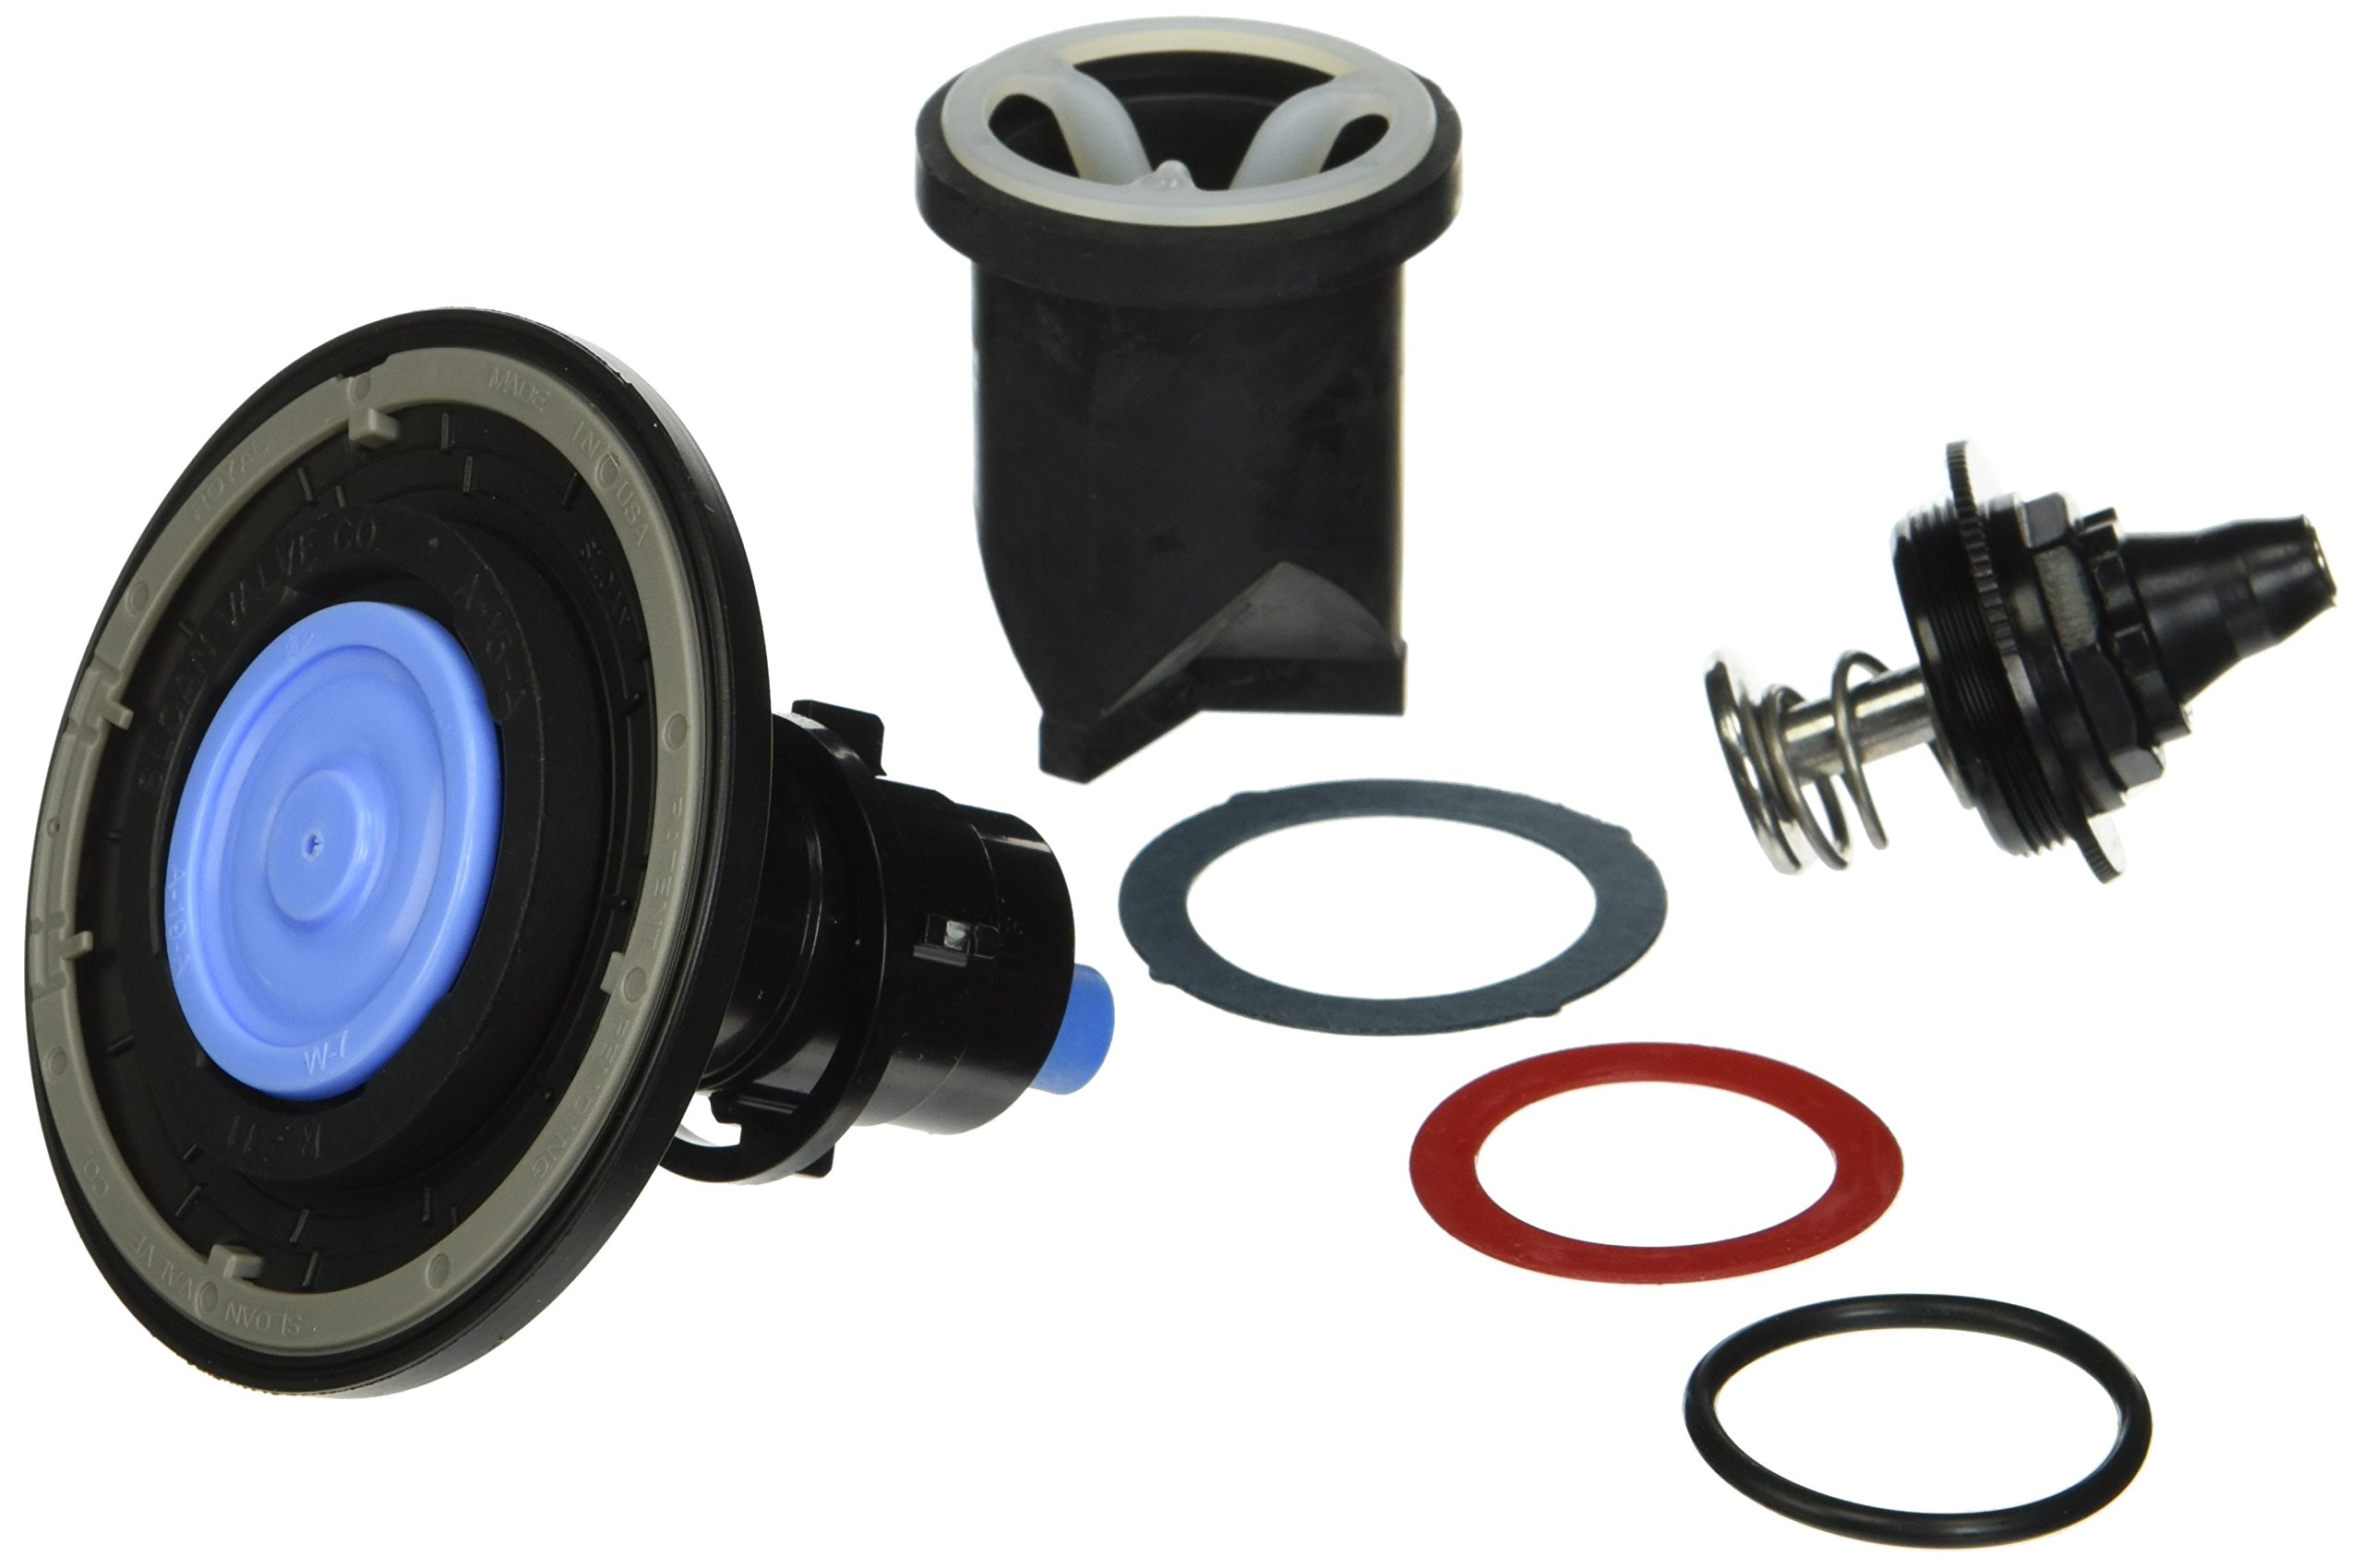 Sloan 3301152 Flushometer Dual-Filtered Performance Kit